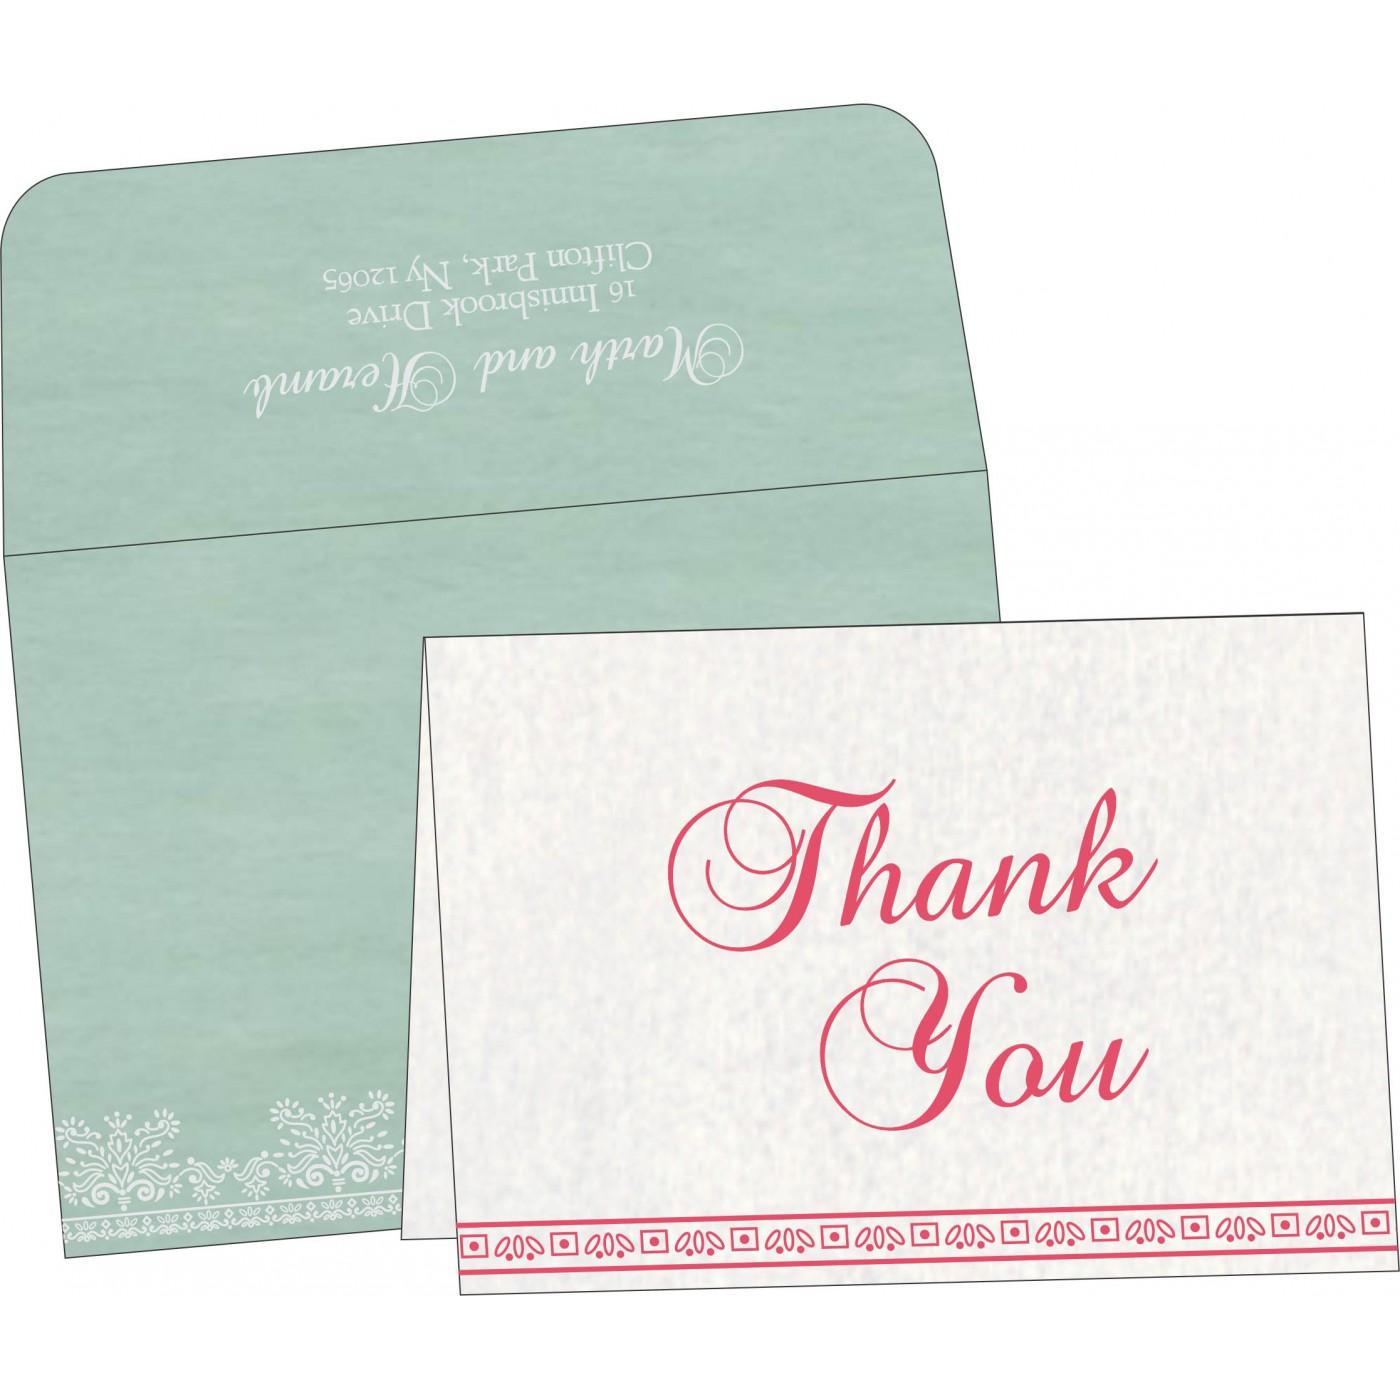 Thank You Cards : TYC-8241C - 123WeddingCards